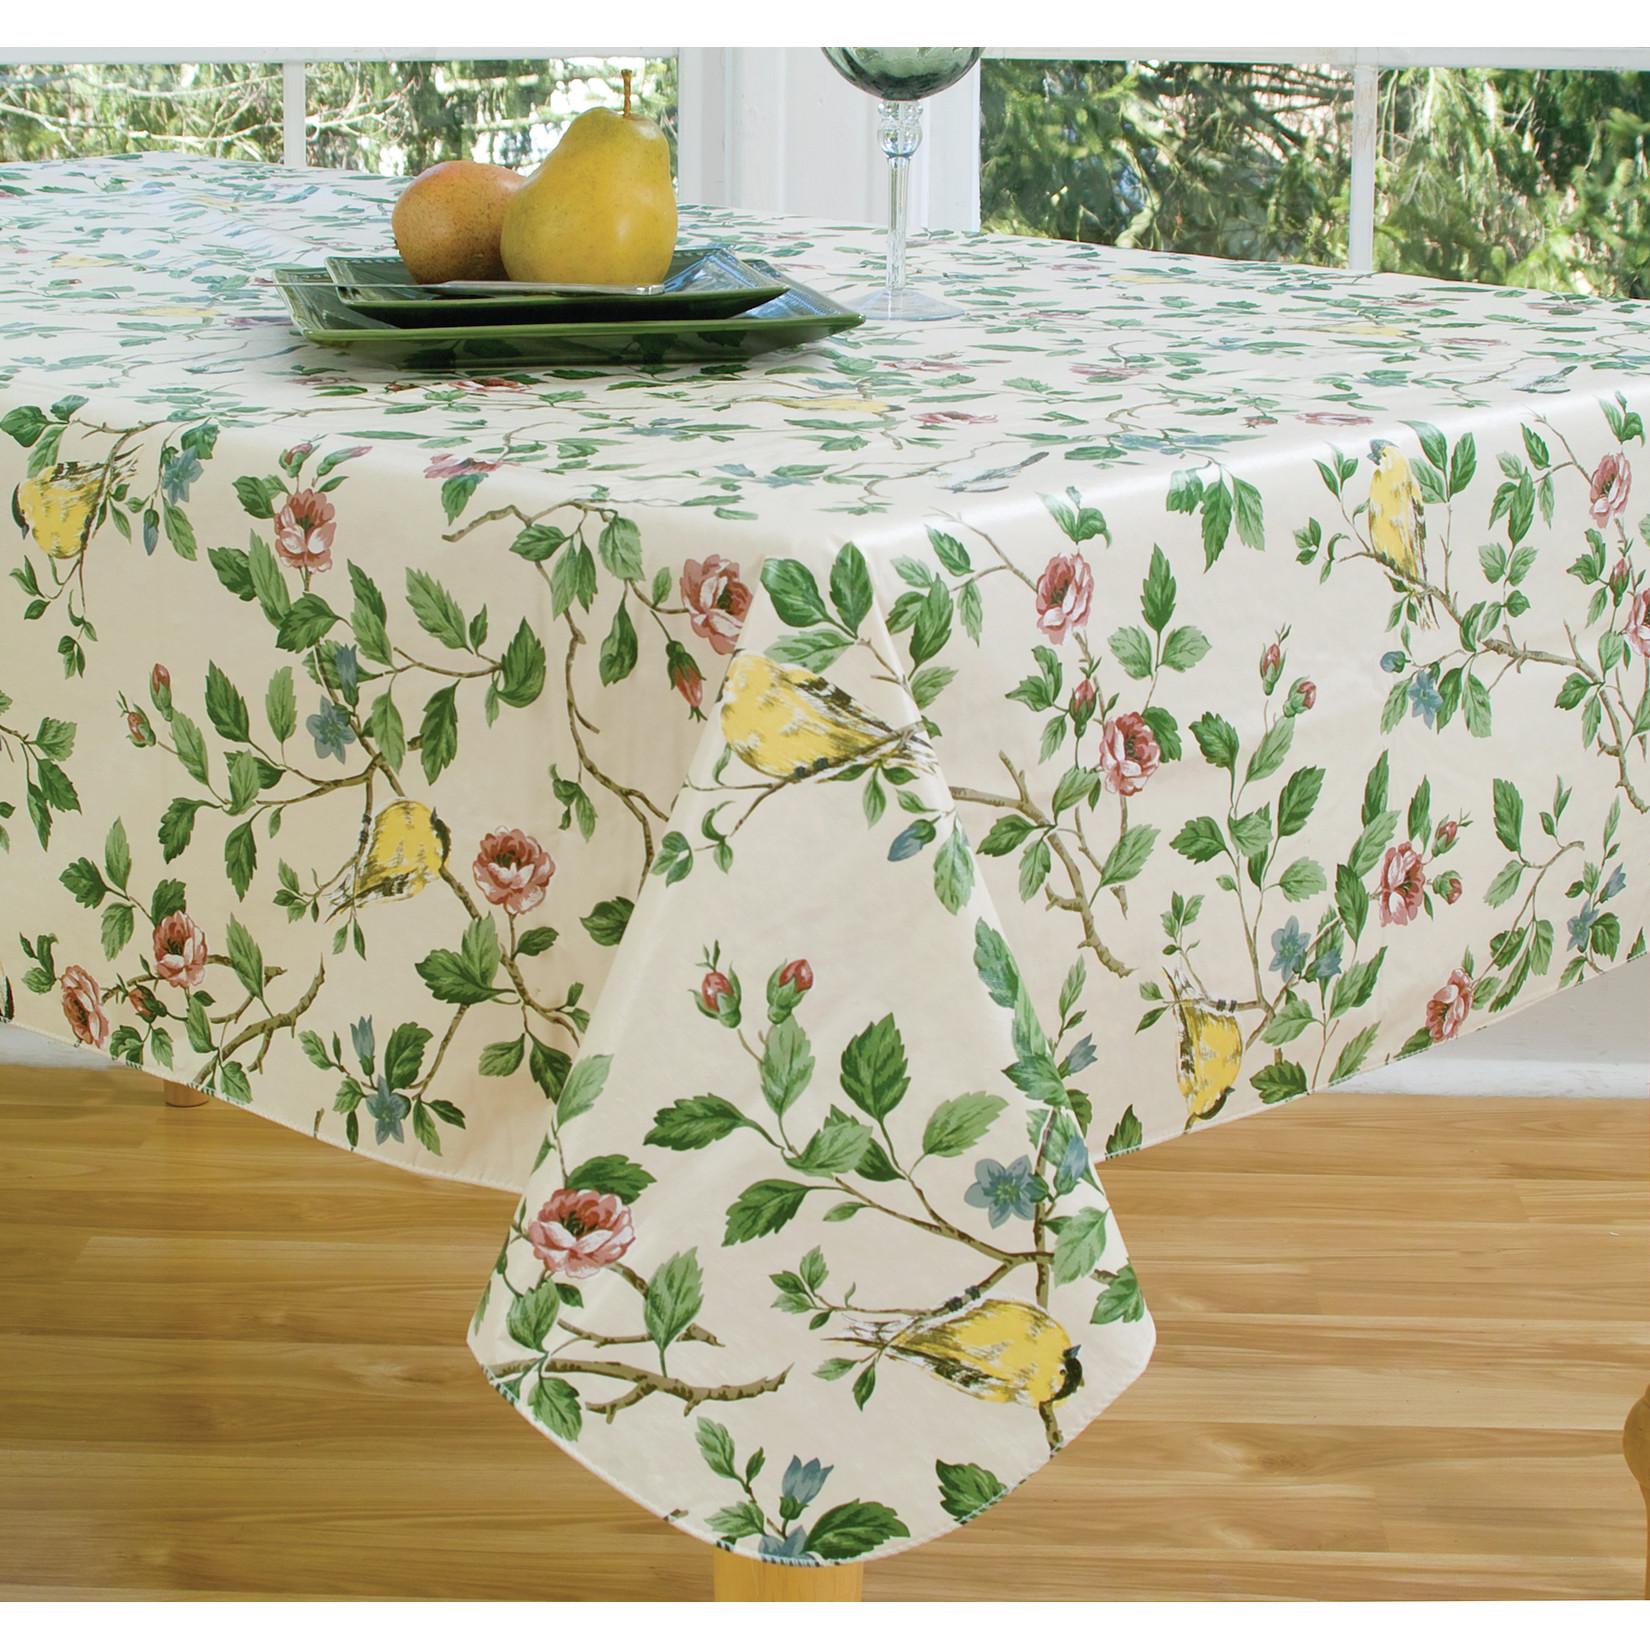 Kitchen Breathtaking Vinyl Tablecloths For Table Decoration Idea